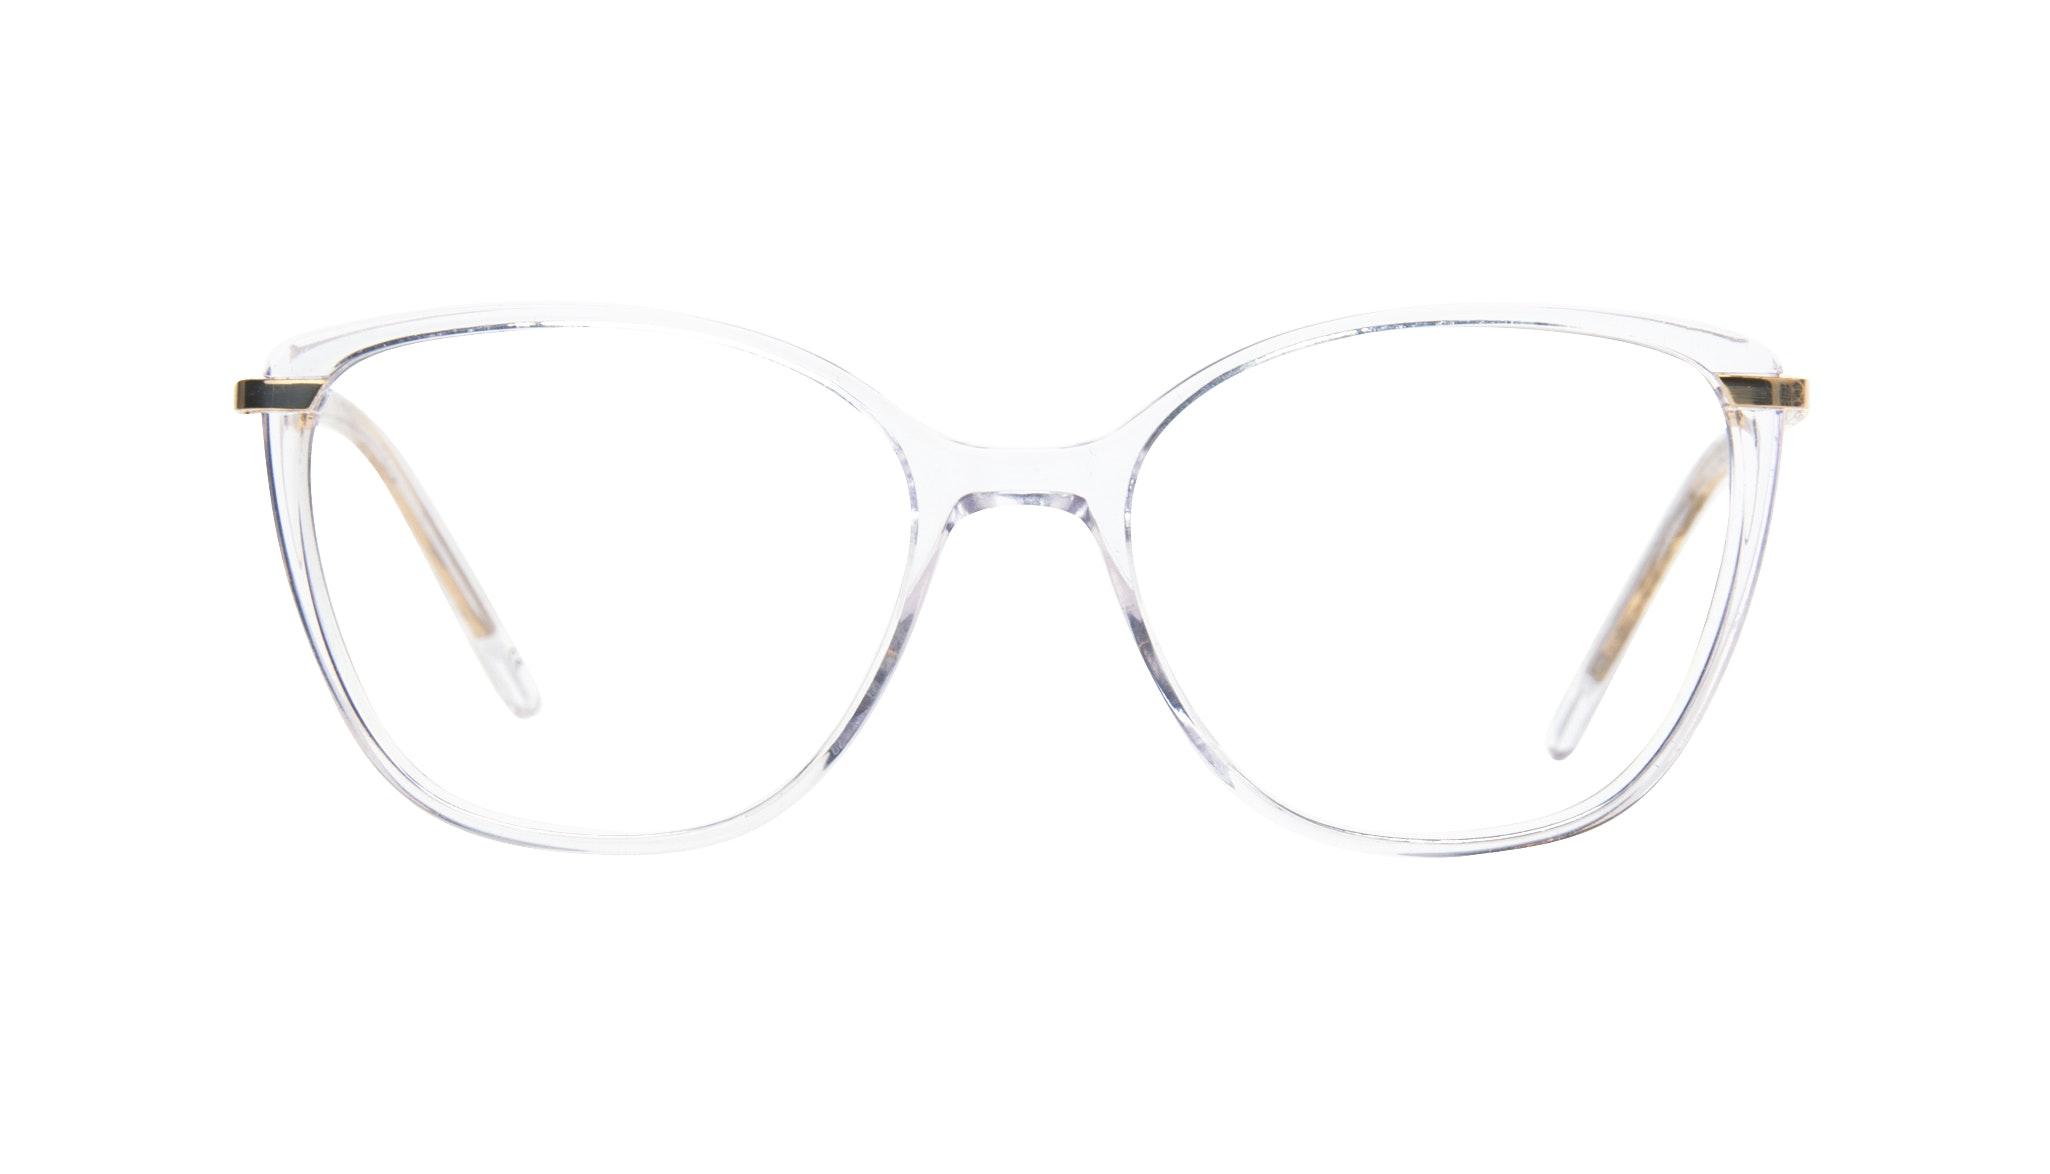 Affordable Fashion Glasses Cat Eye Rectangle Square Eyeglasses Women Illusion Gold Diamond Front